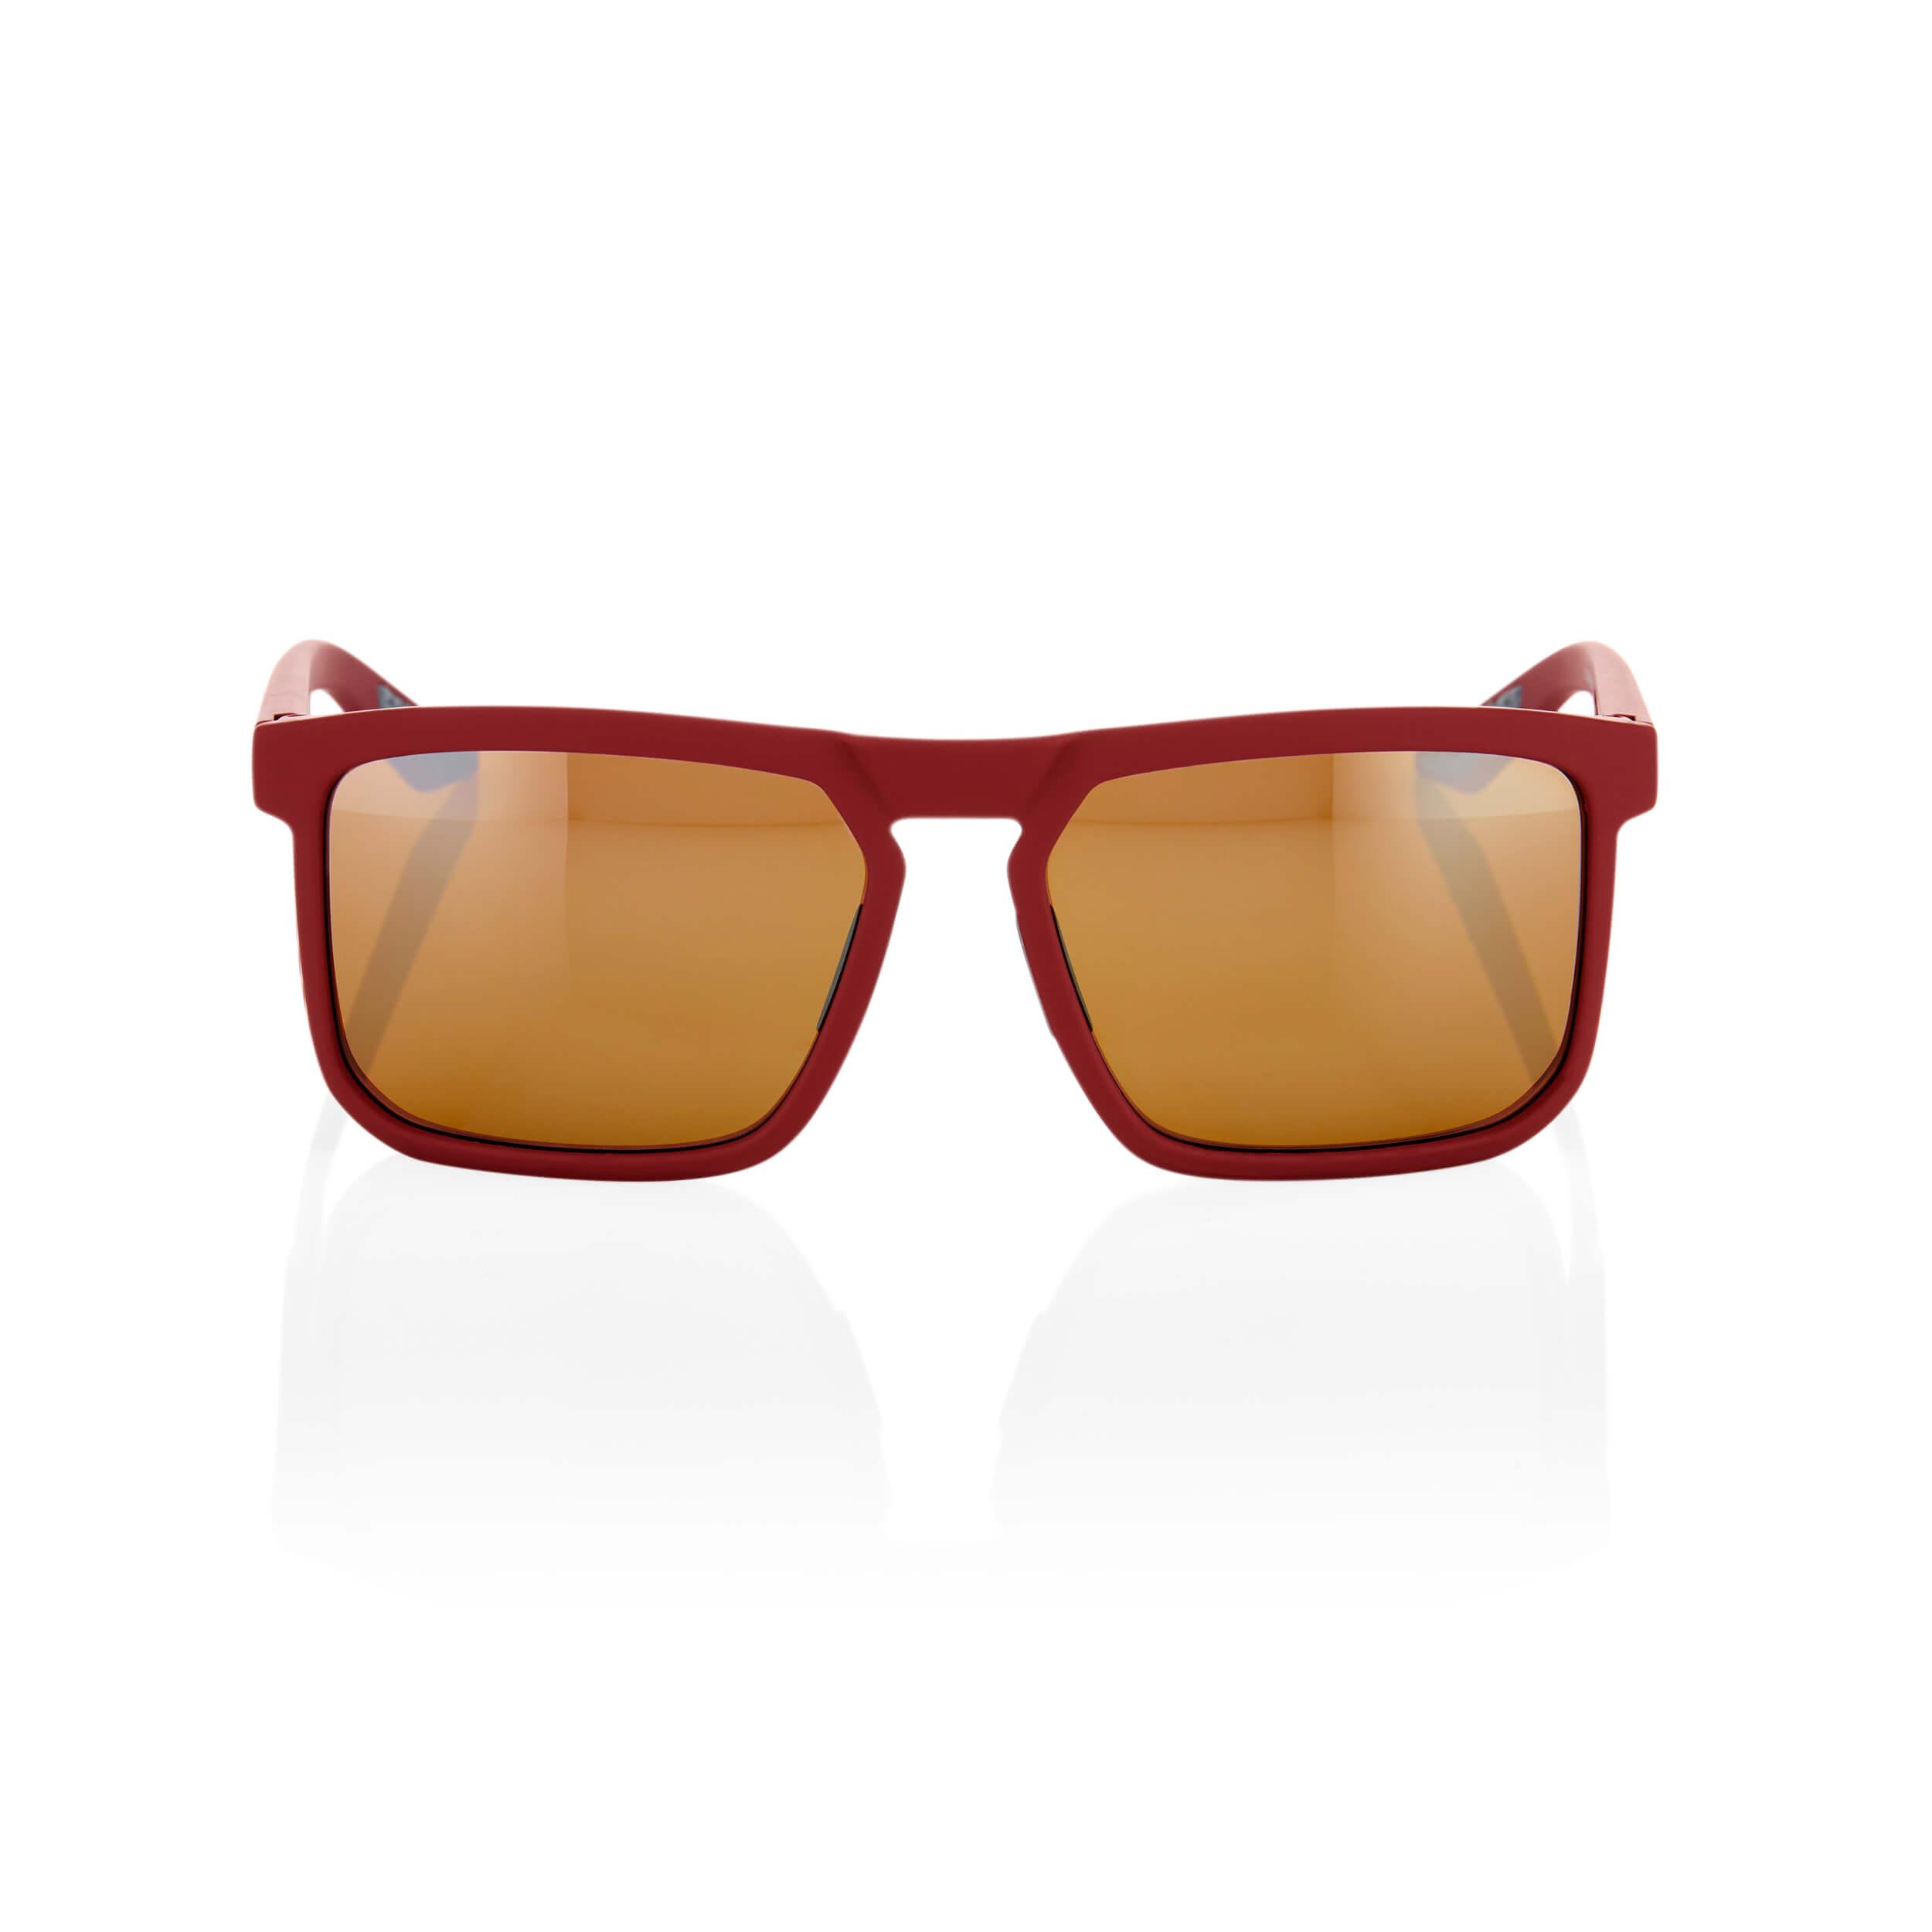 RENSHAW – Soft Tact Crimson – Bronze Lens